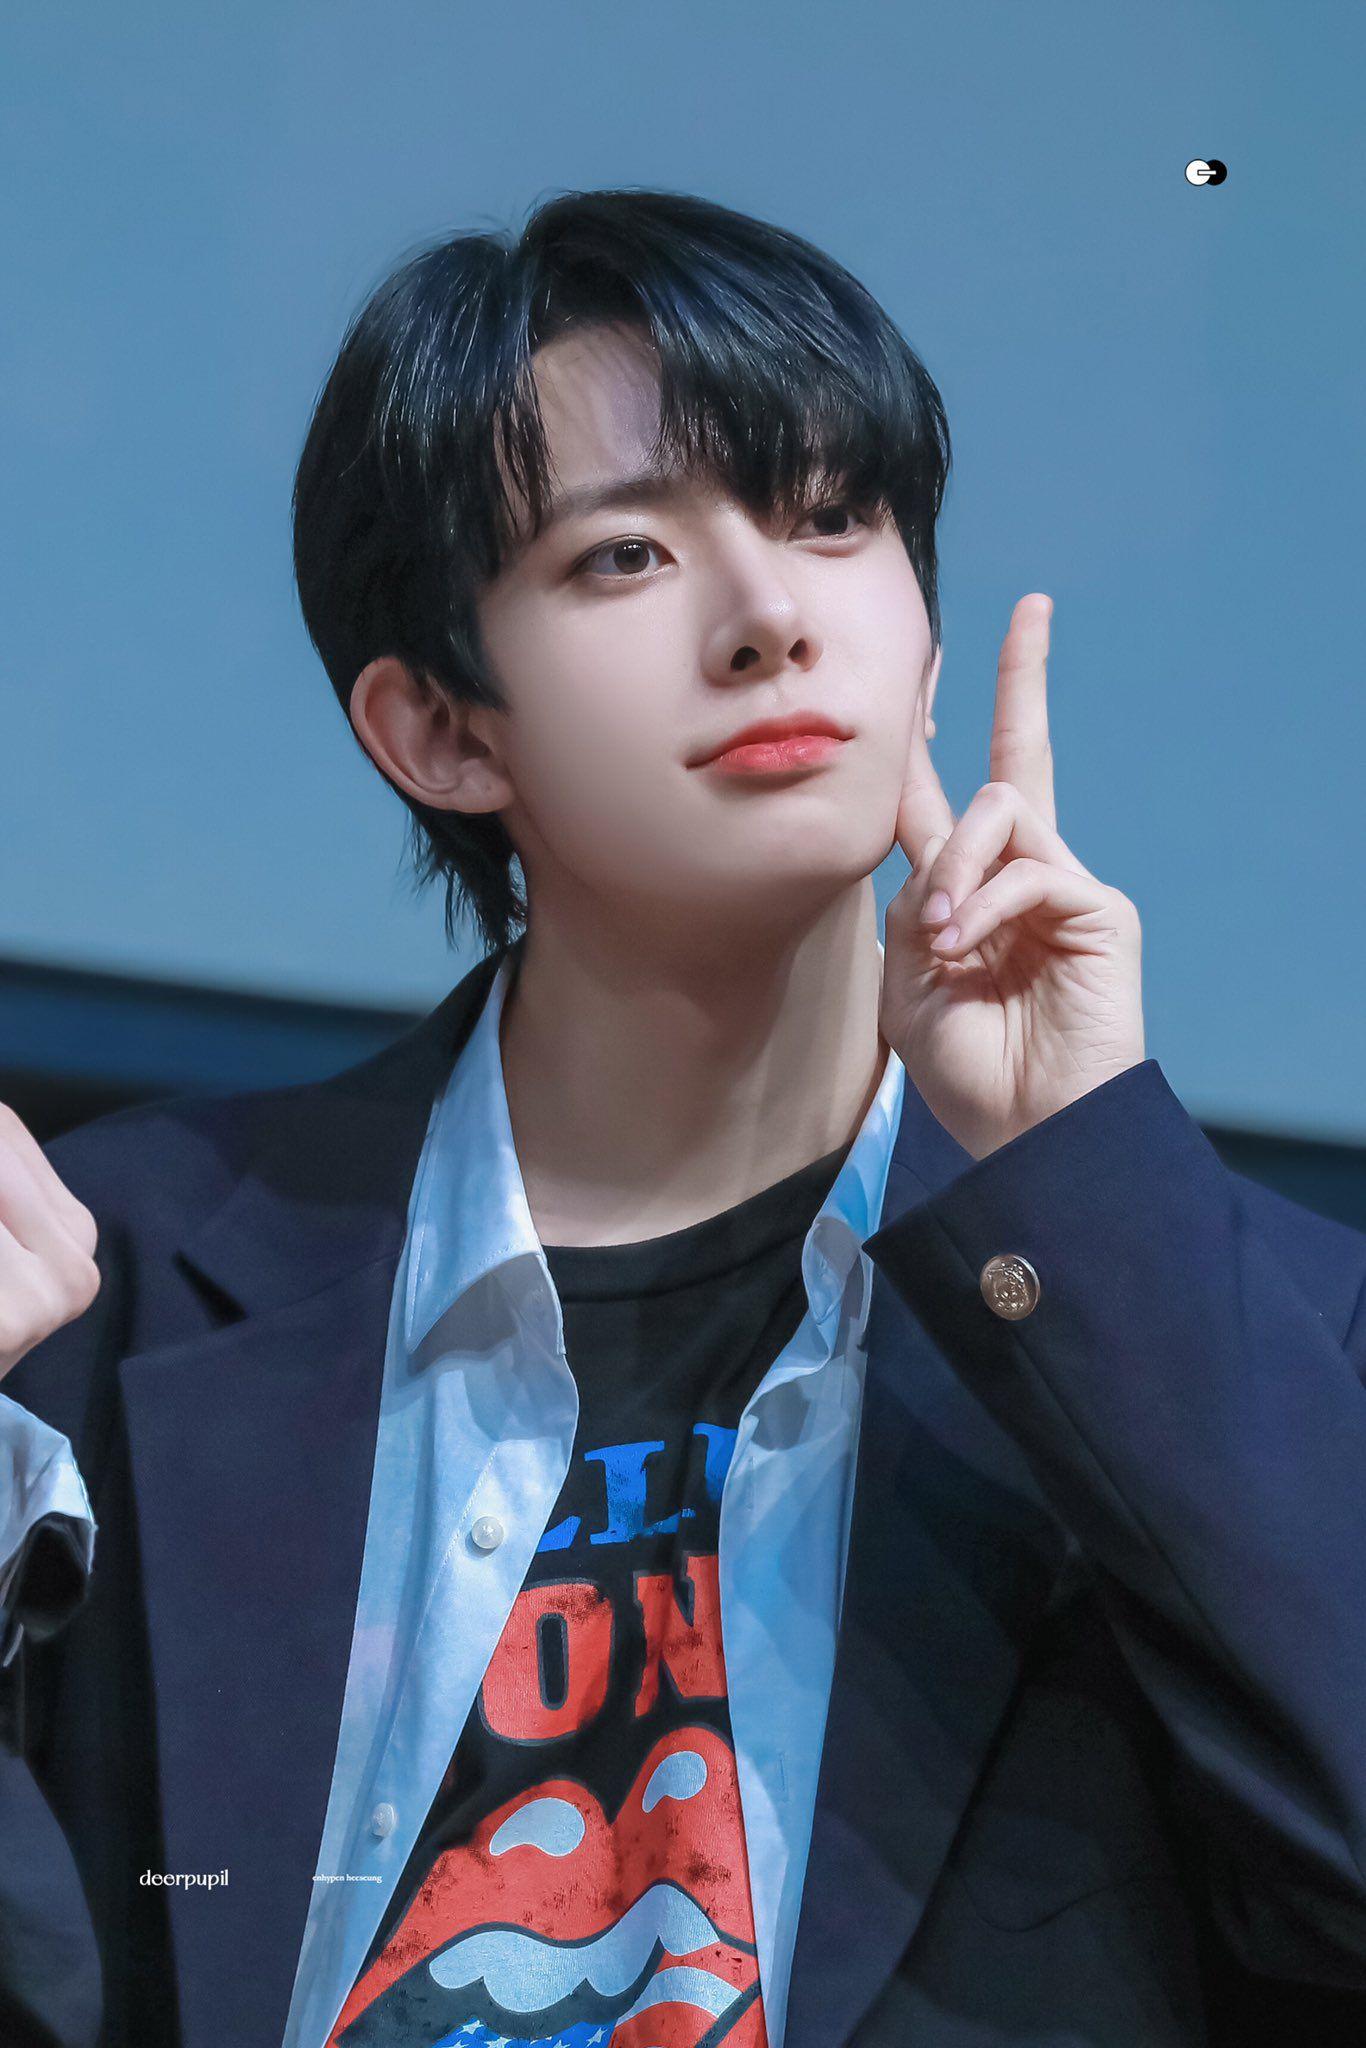 210509 Deerpupil 1015 In 2021 Boyfriend Pictures Boyfriend Material Fandom Kpop